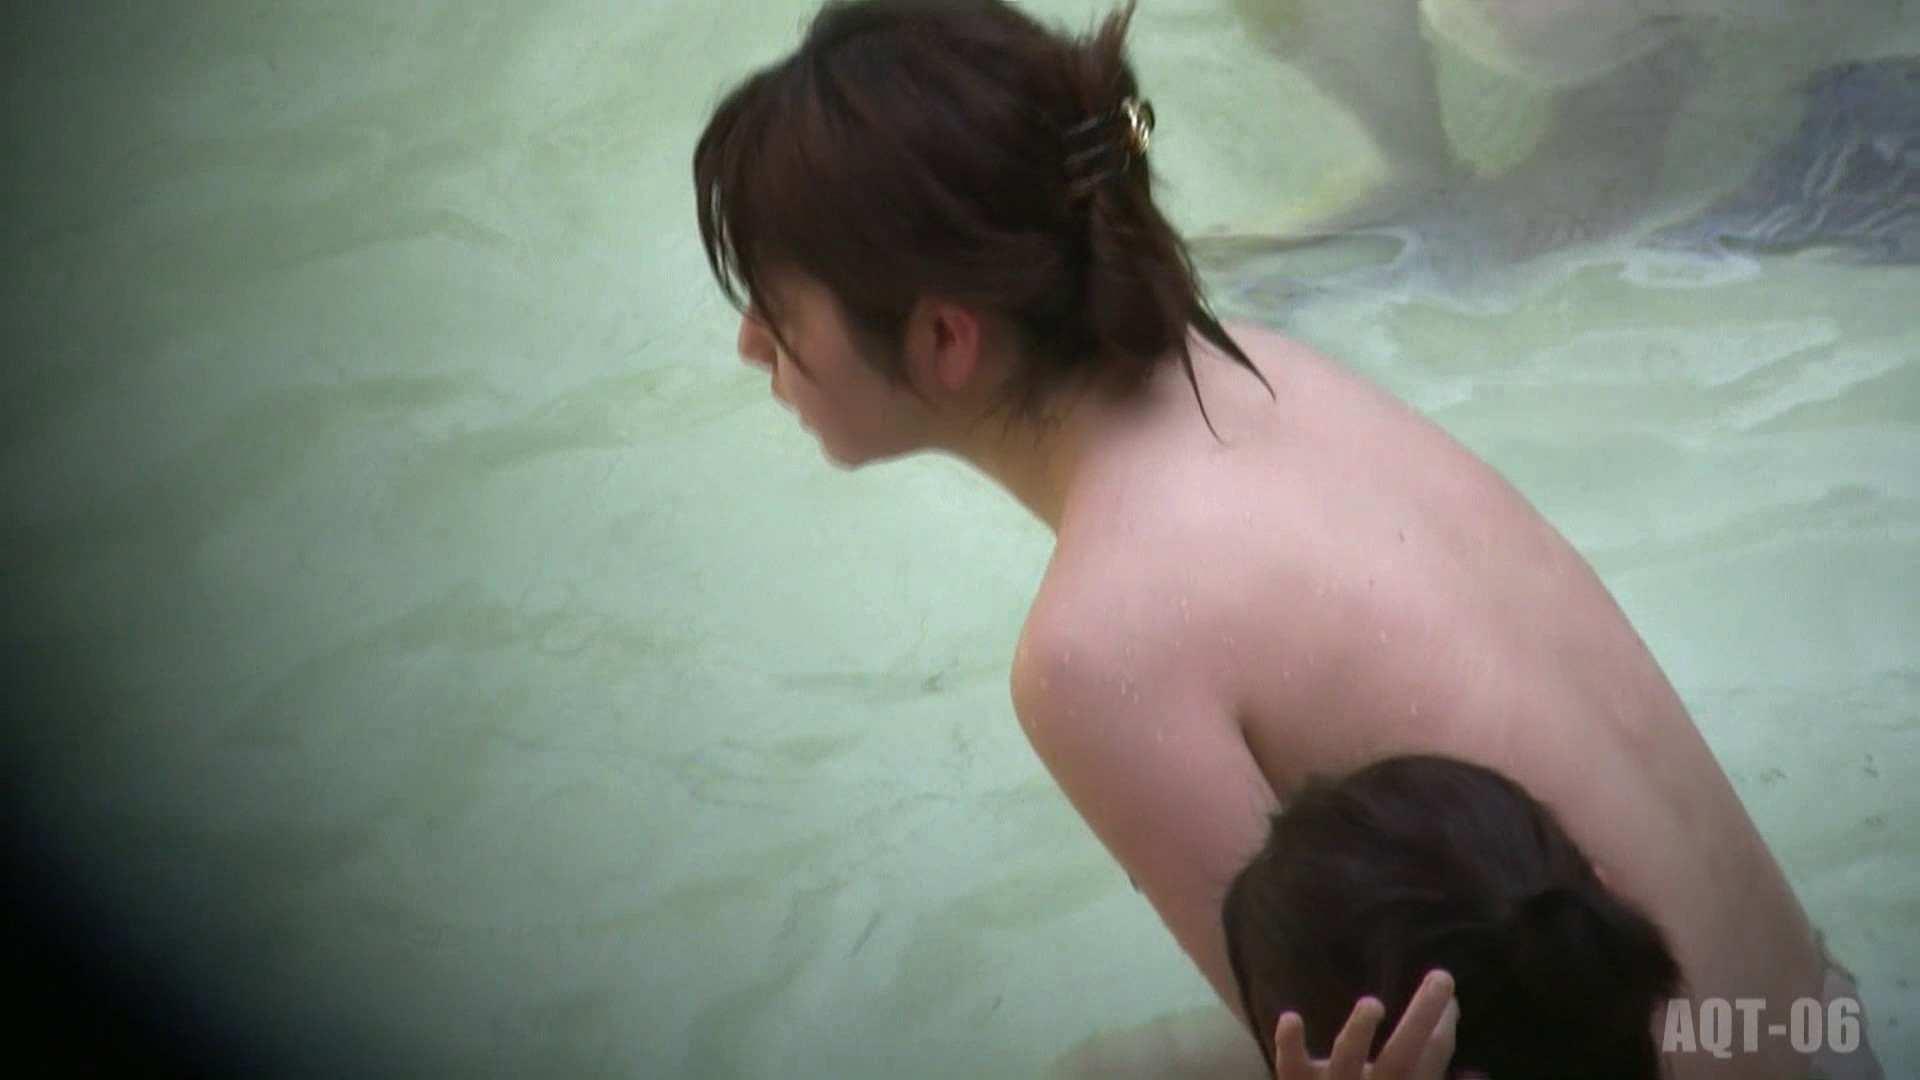 Aquaな露天風呂Vol.754 女体盗撮 | OL女体  61連発 7